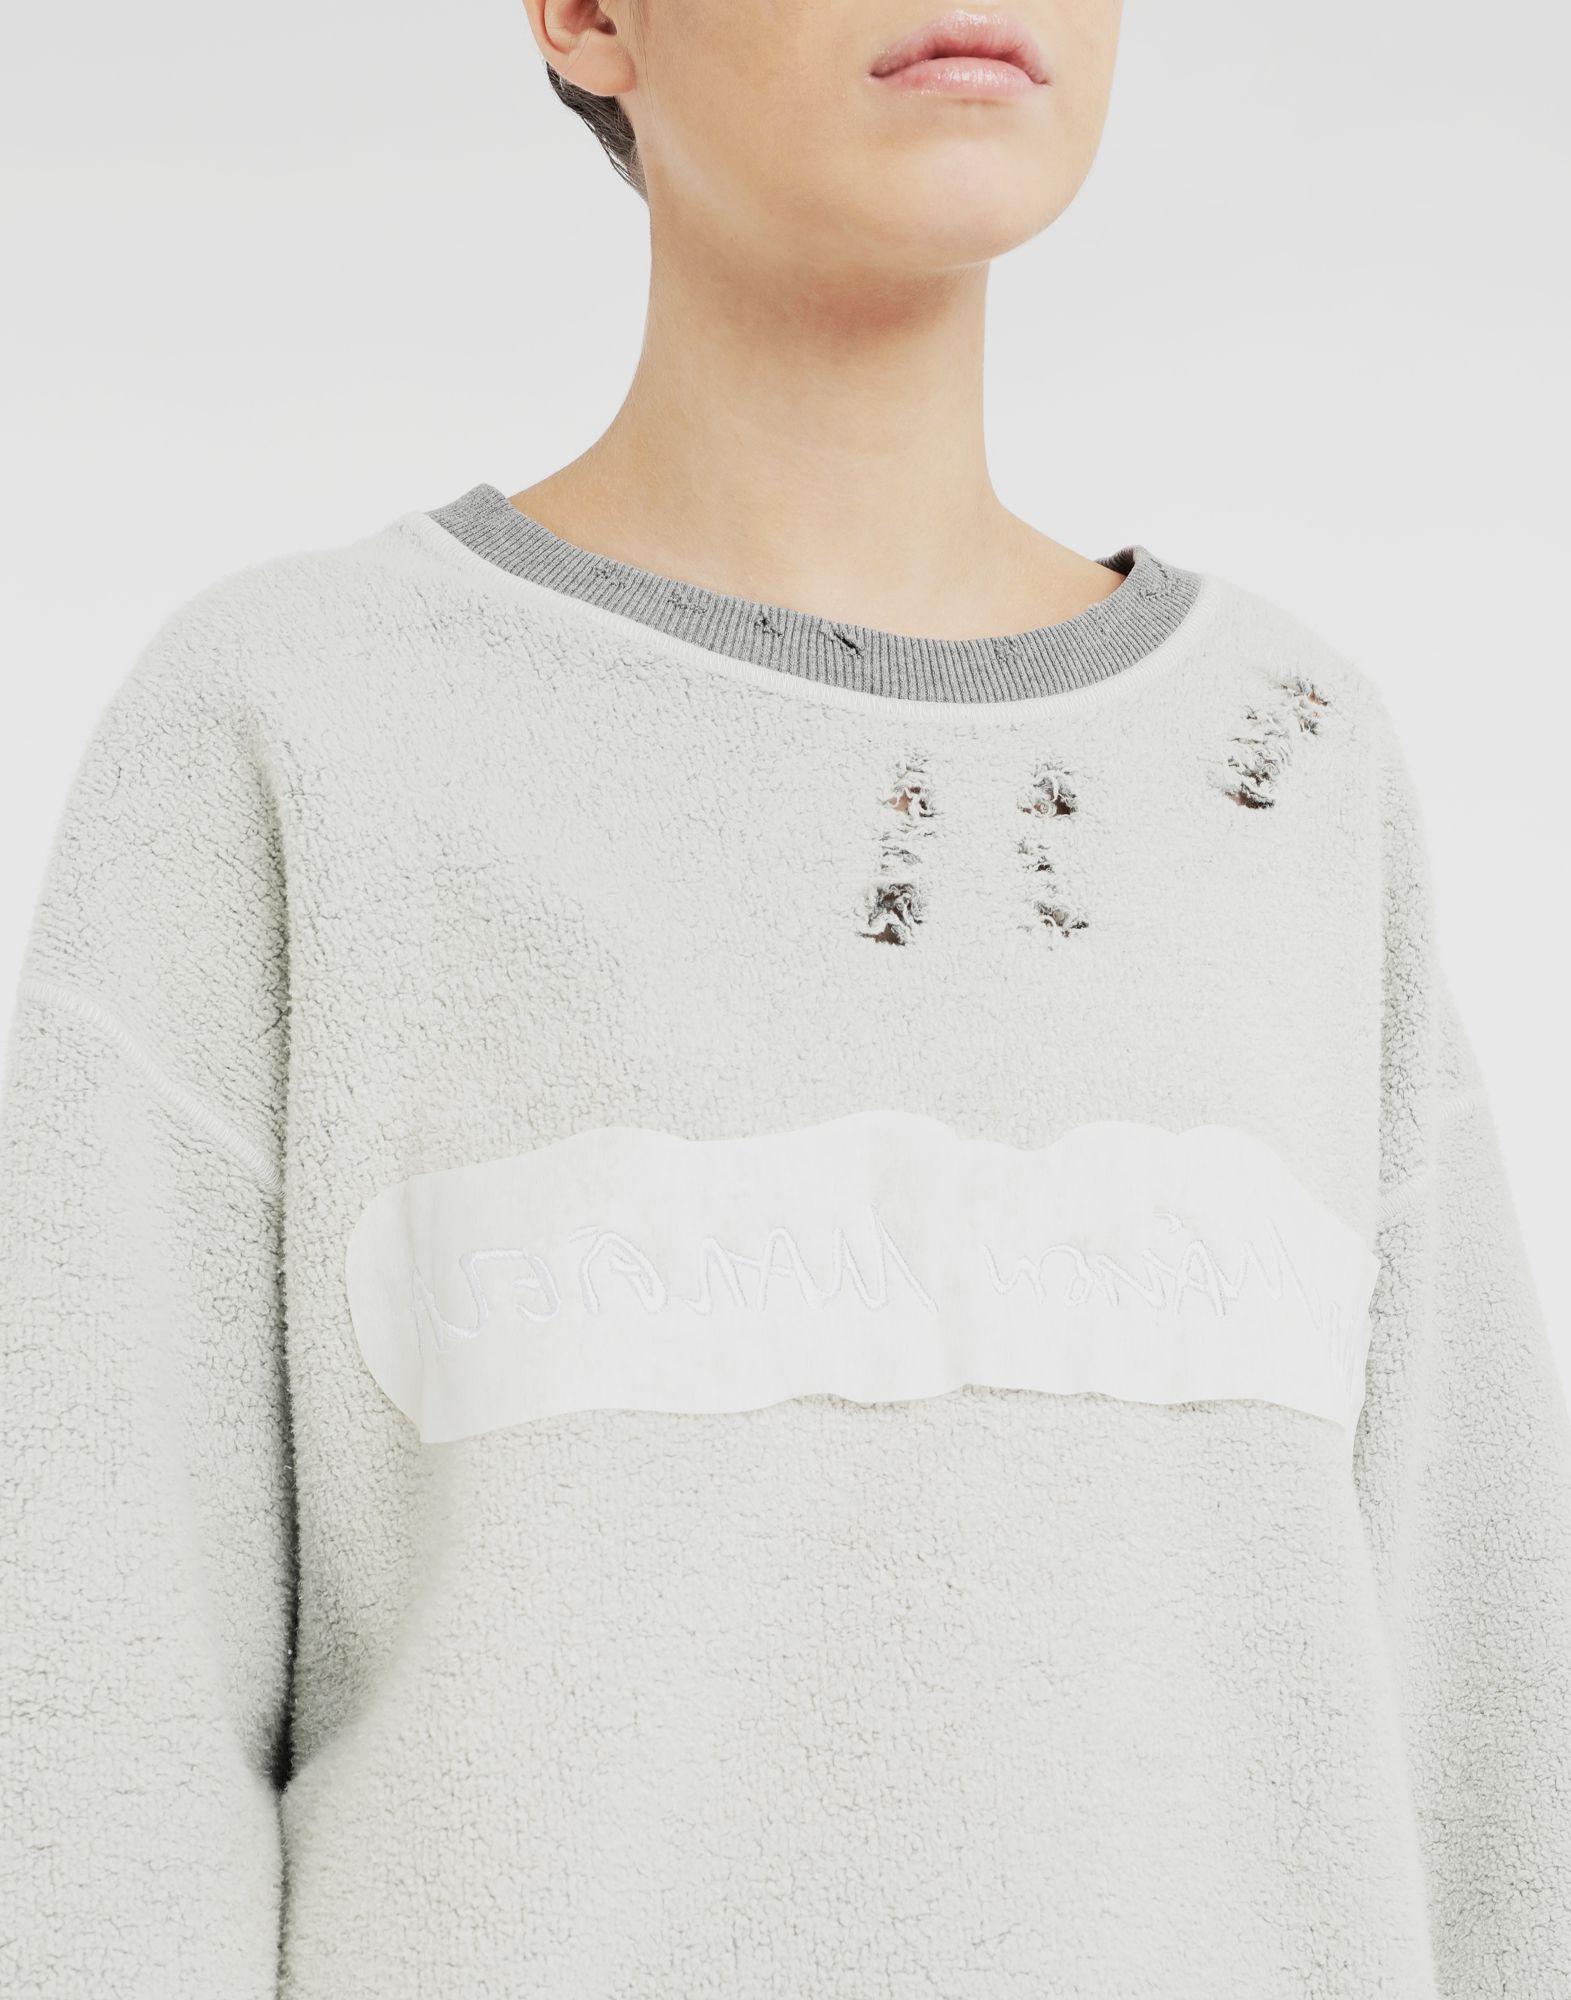 MM6 MAISON MARGIELA Logo reversible sweatshirt Sweatshirt Woman a